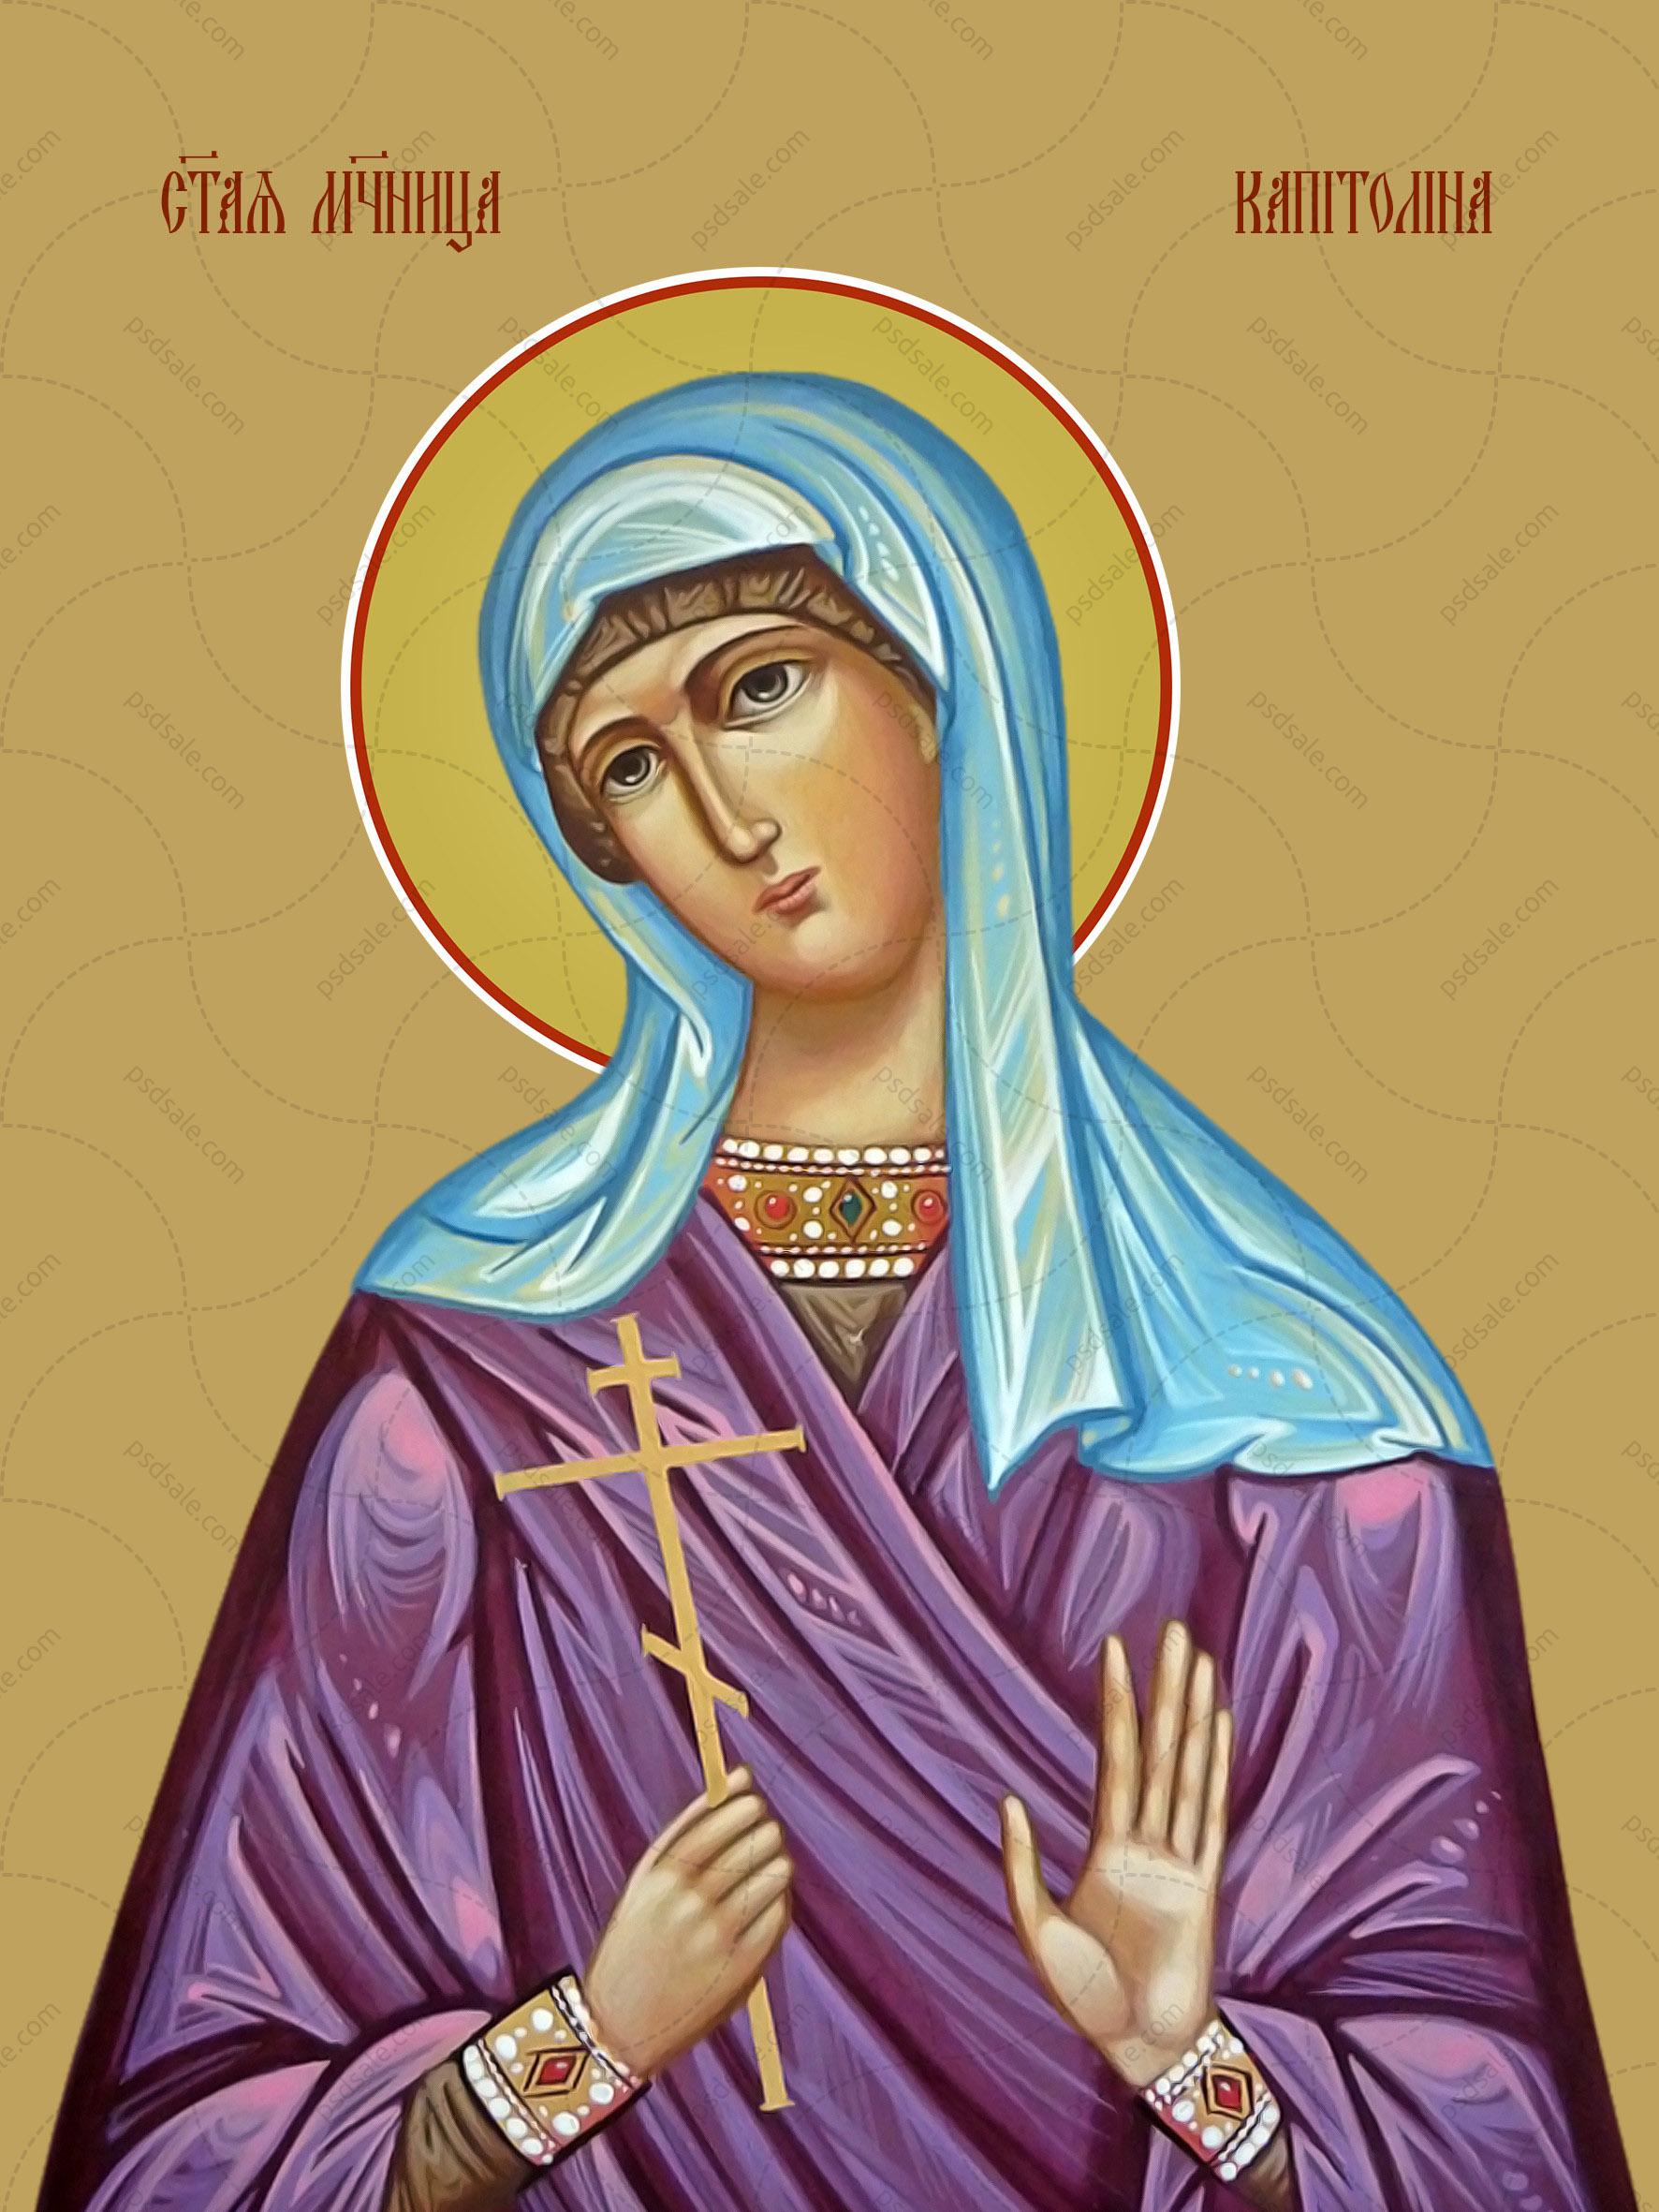 Капитолина, святая мученица